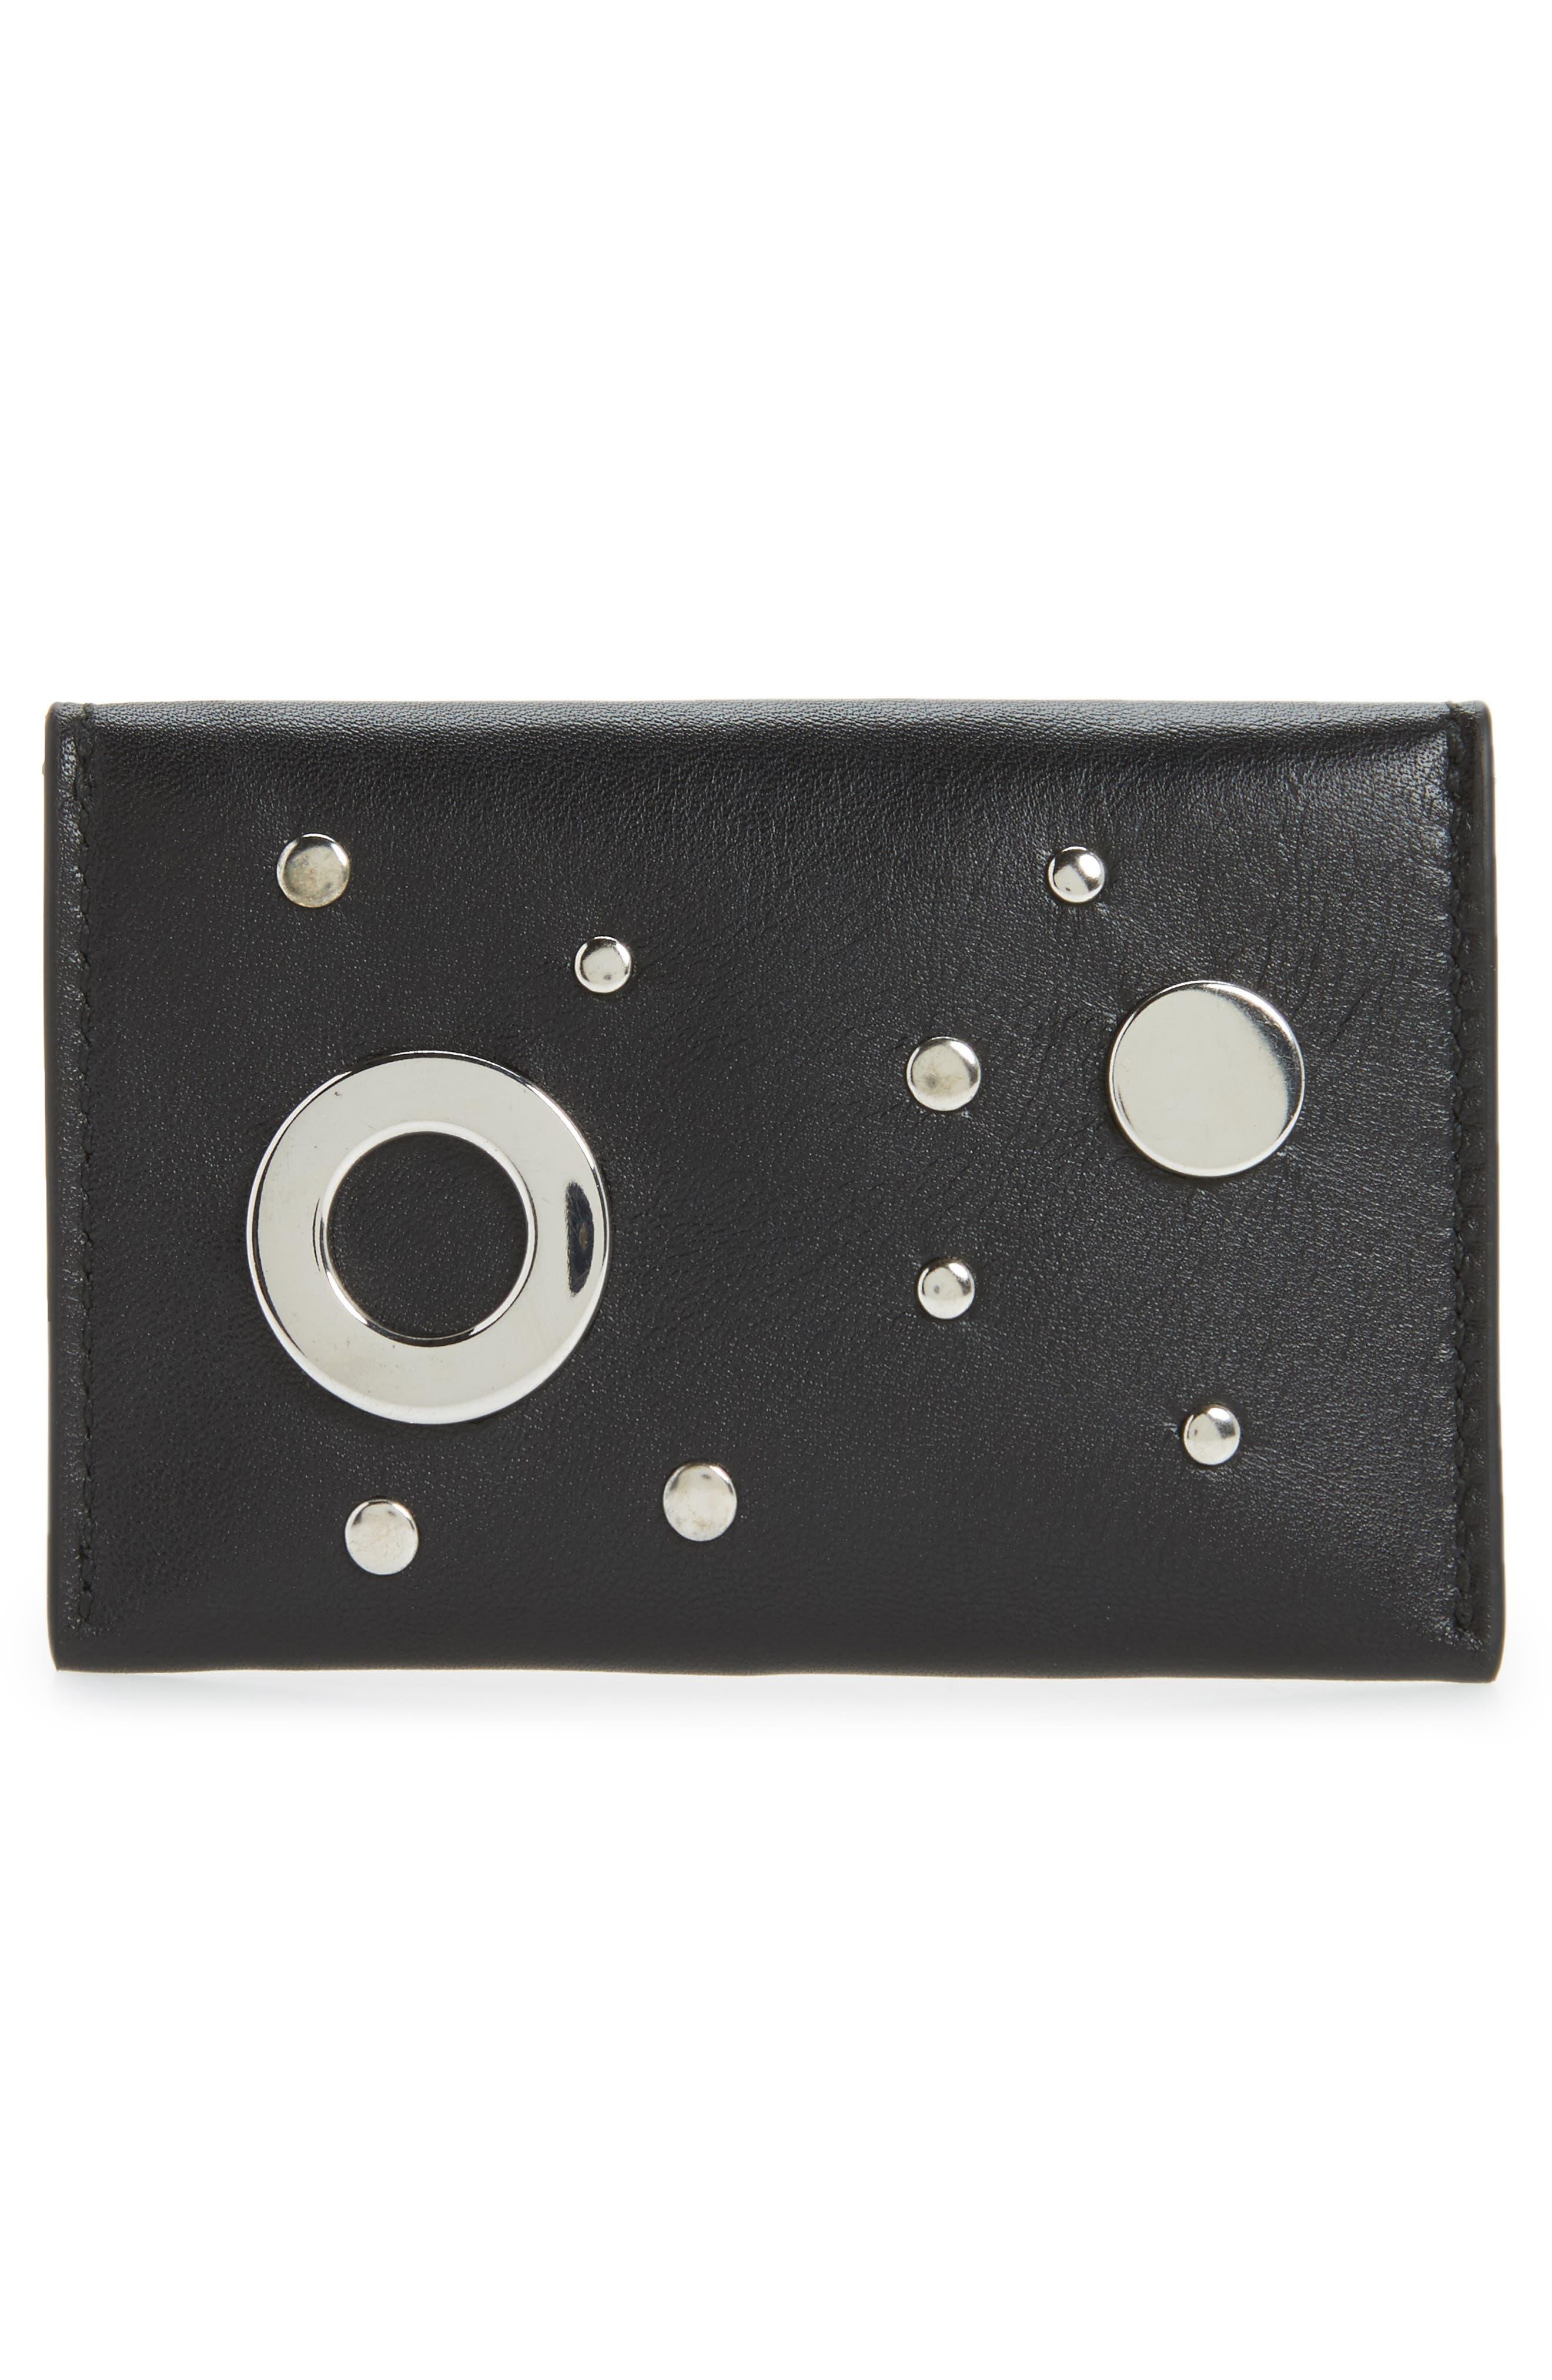 Calfskin Leather Envelope Card Holder,                             Alternate thumbnail 2, color,                             Black